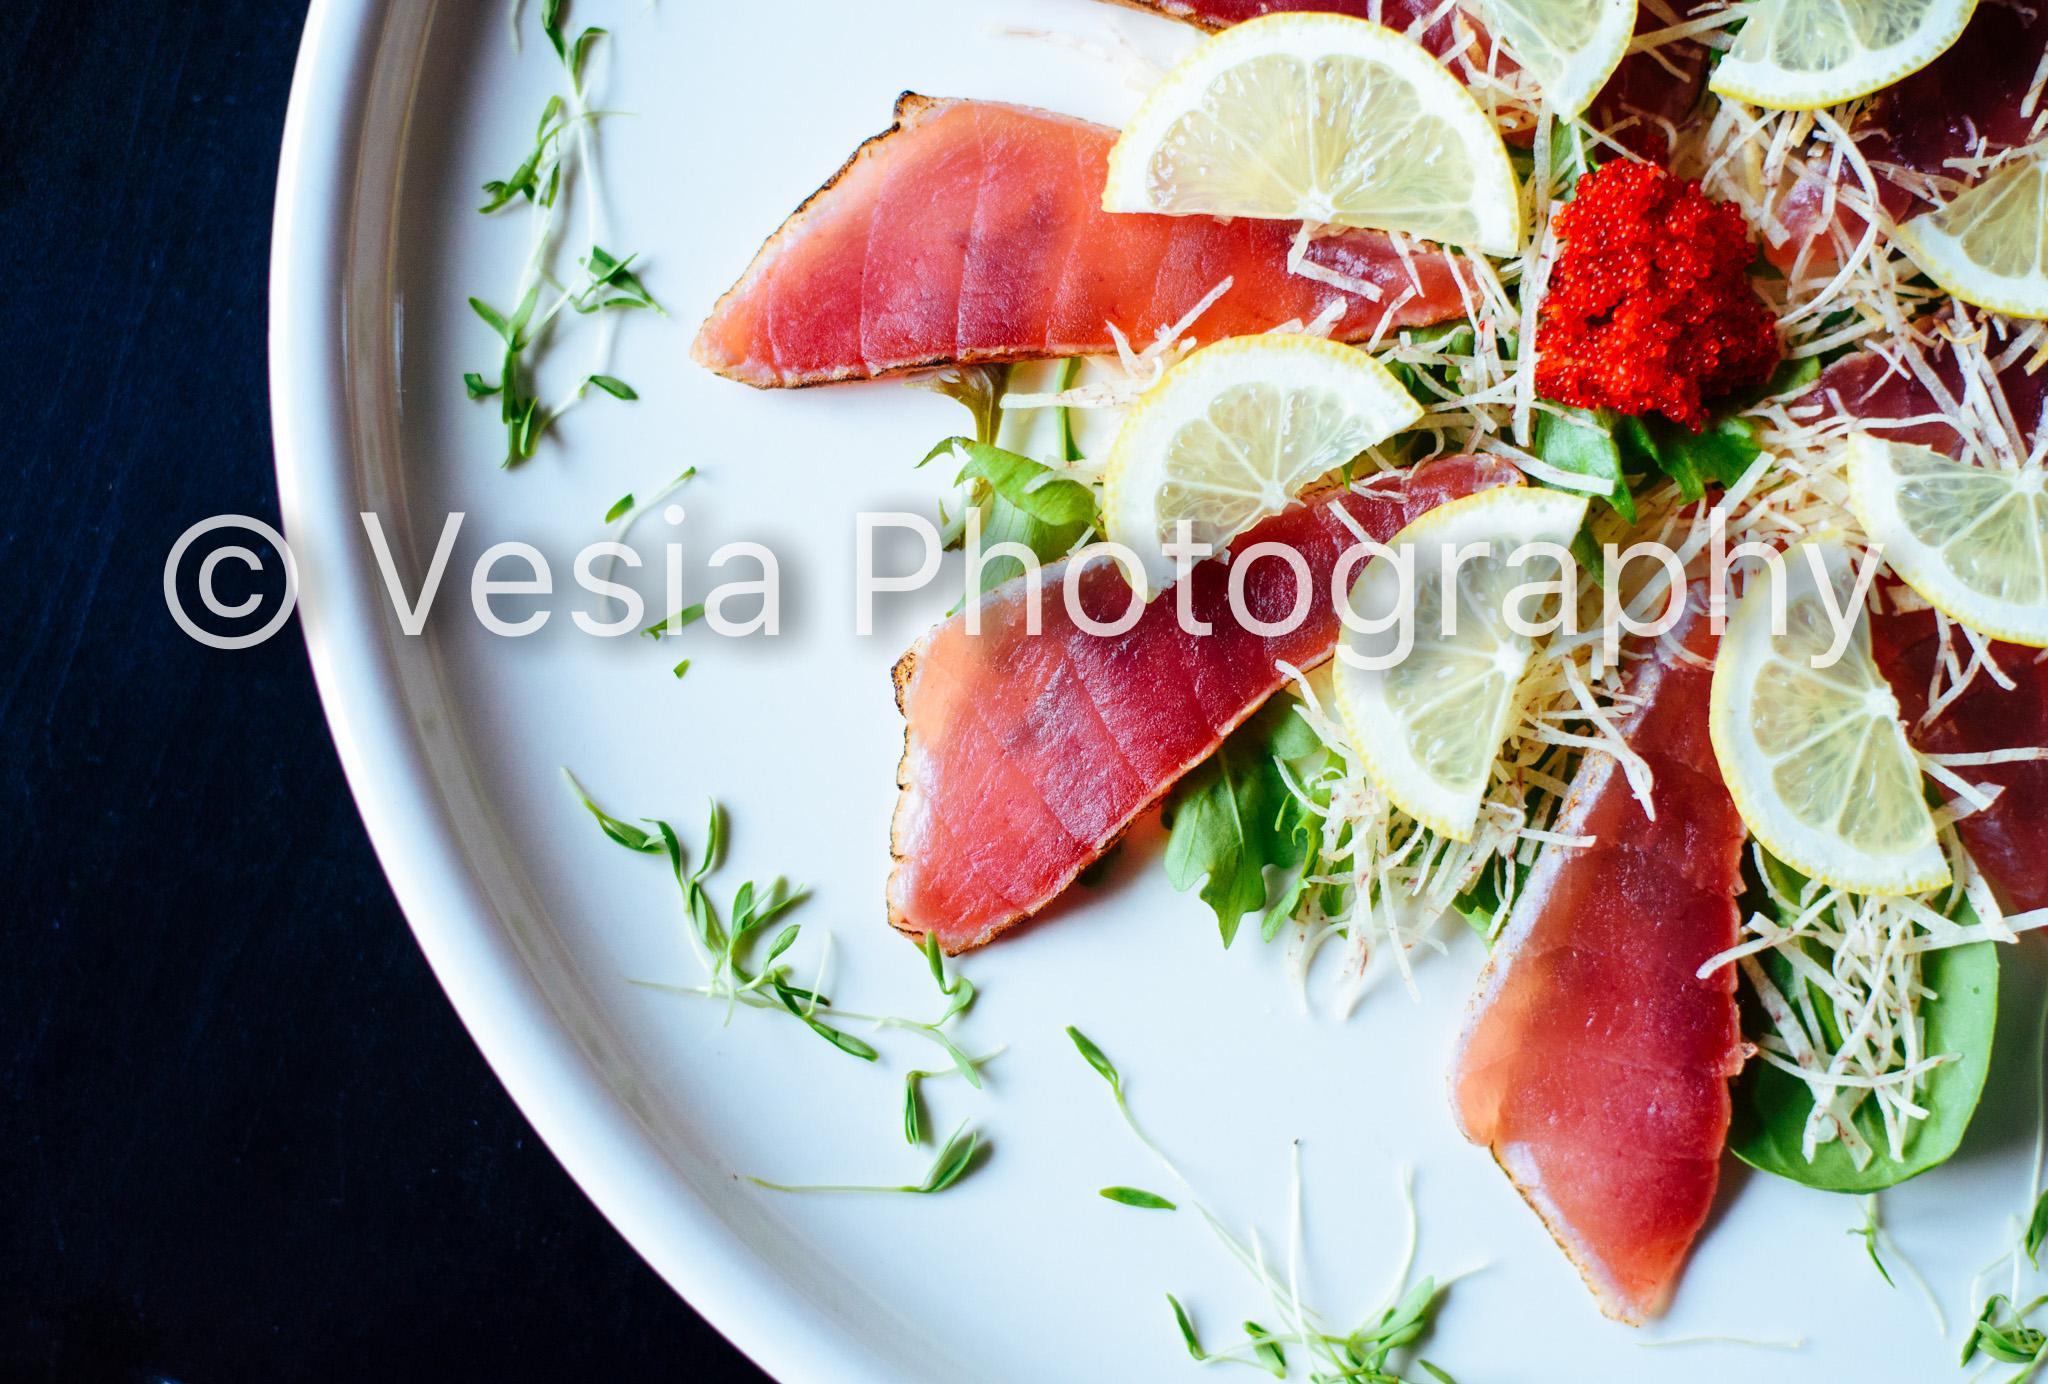 Caviar_Sushi_Proofs-4.jpg